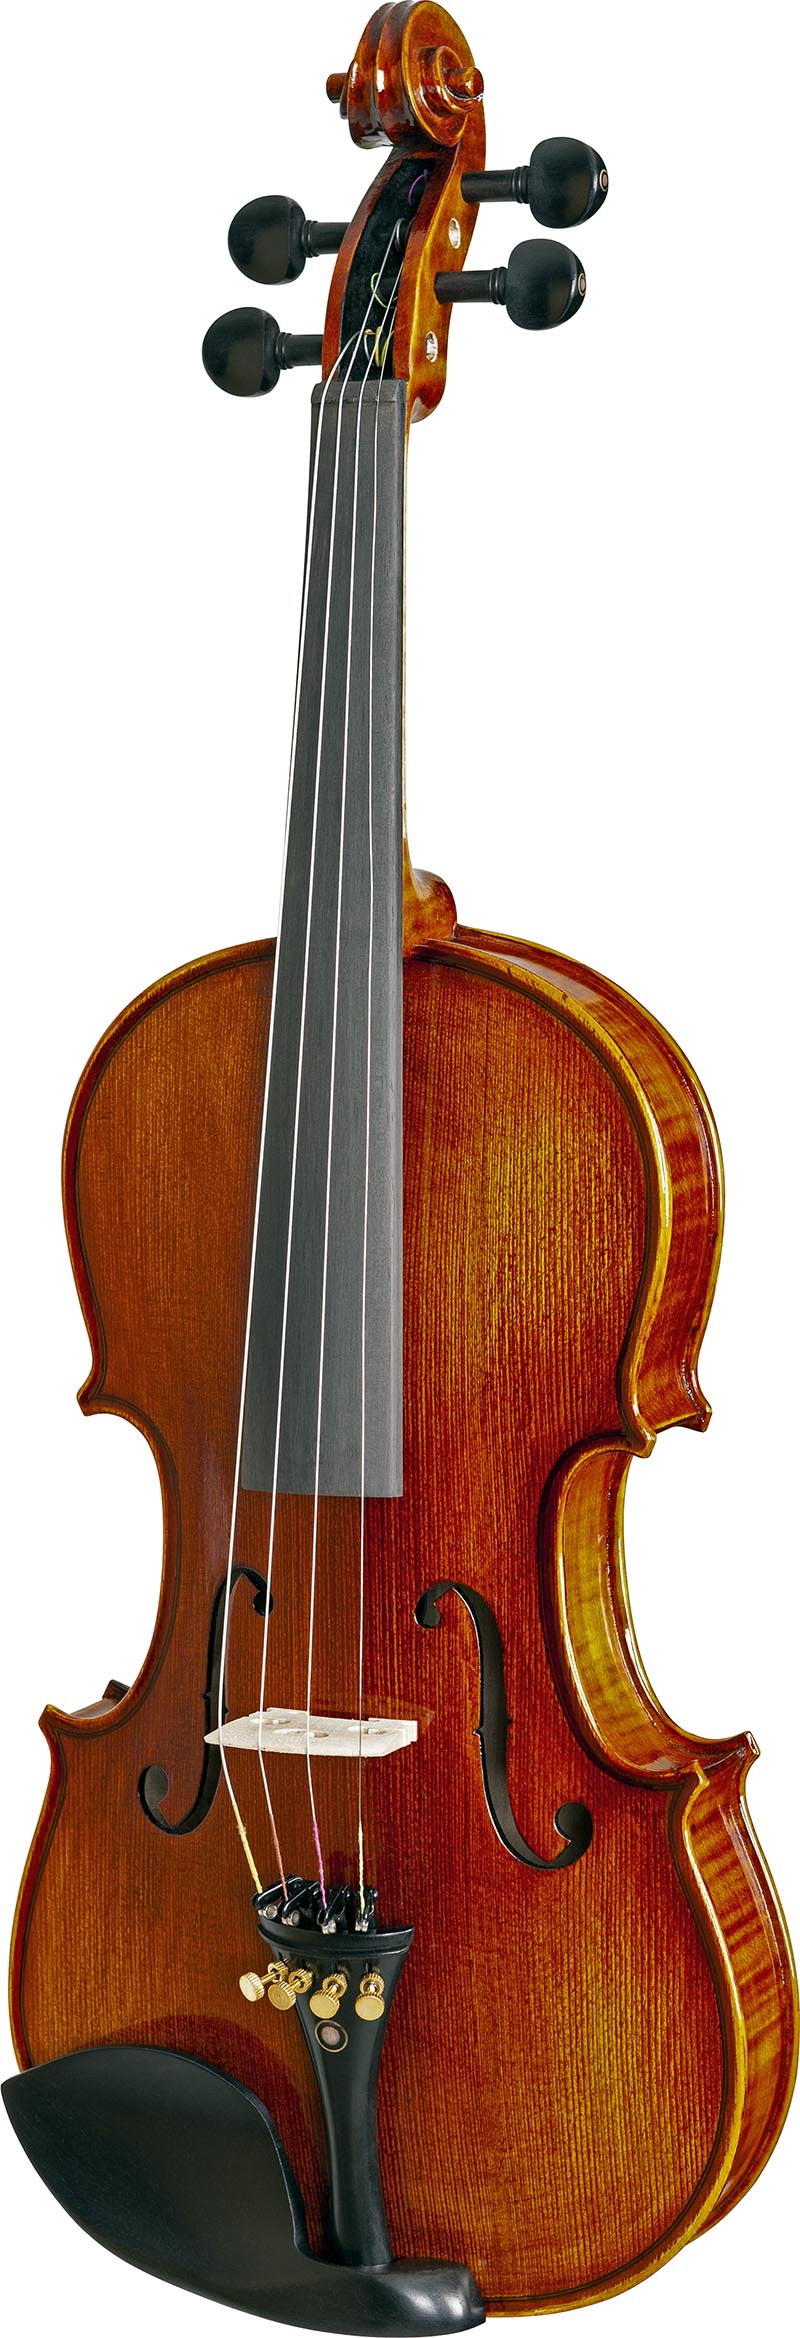 vk544 violino eagle vk544 visao frontal vertical